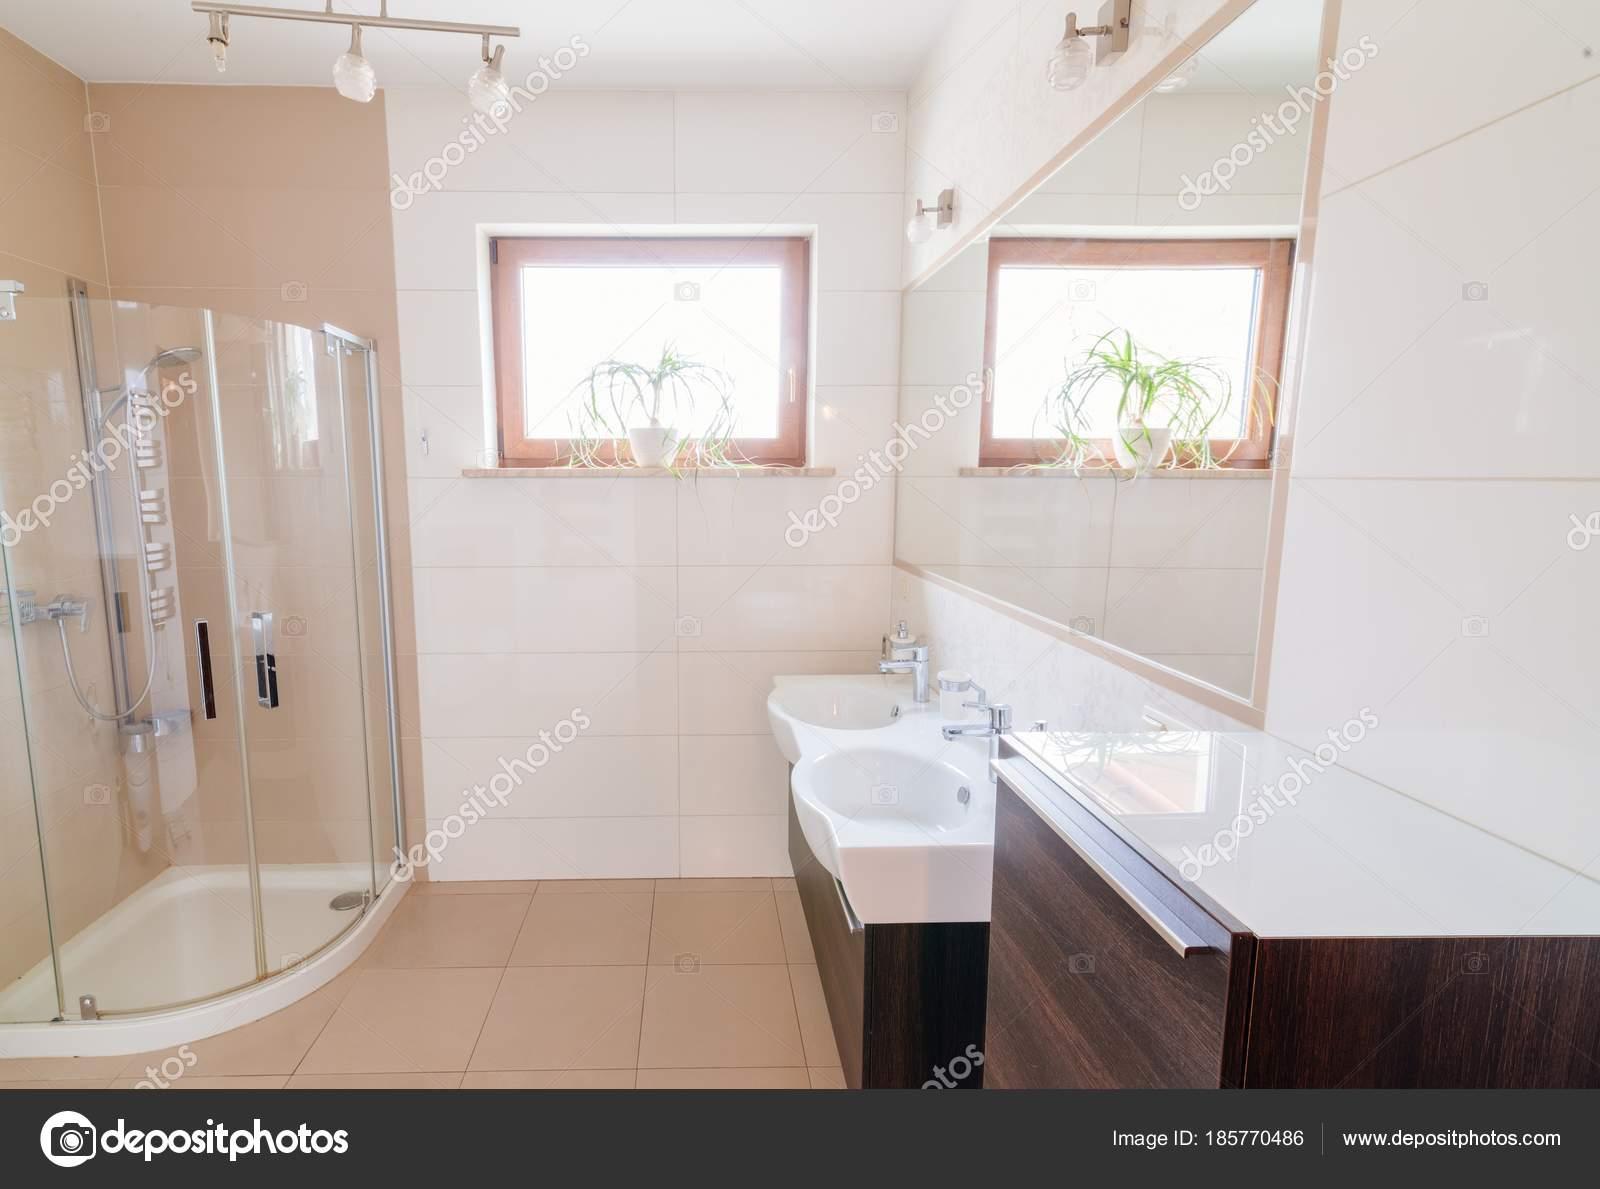 Moderno cuarto de baño con cabina de ducha de vidrio — Fotos de ...